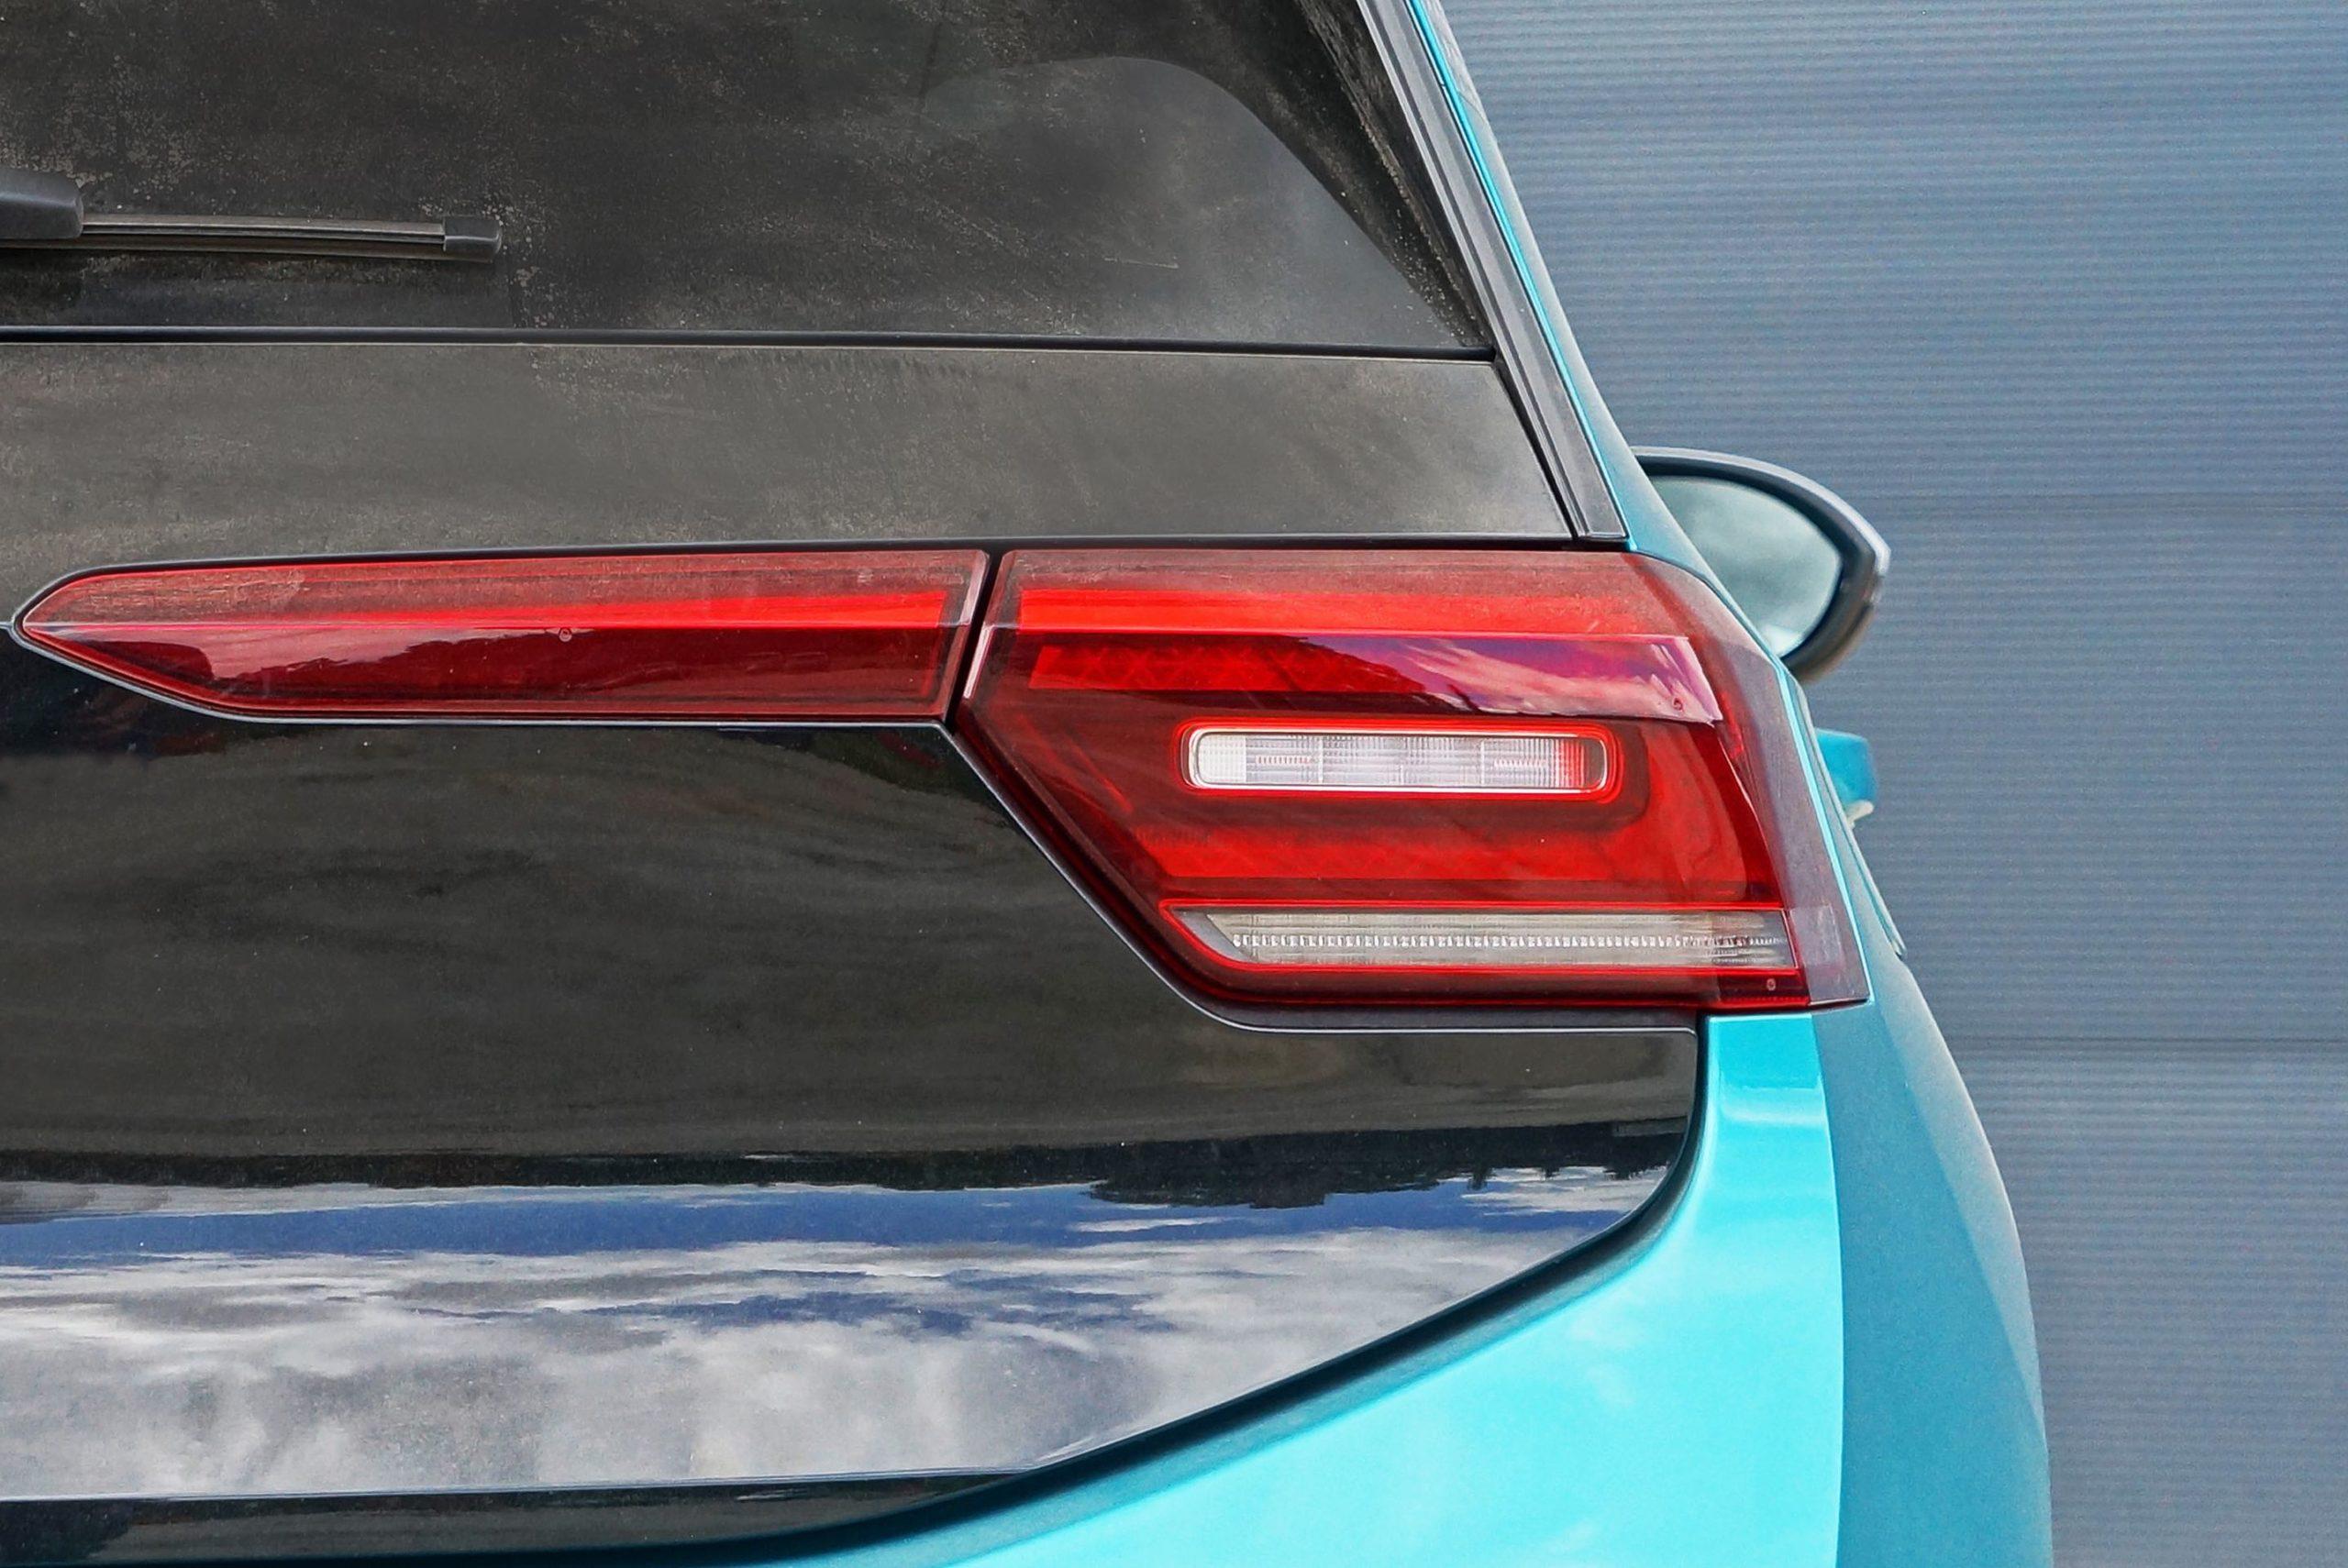 VW ID 3 Rear Light